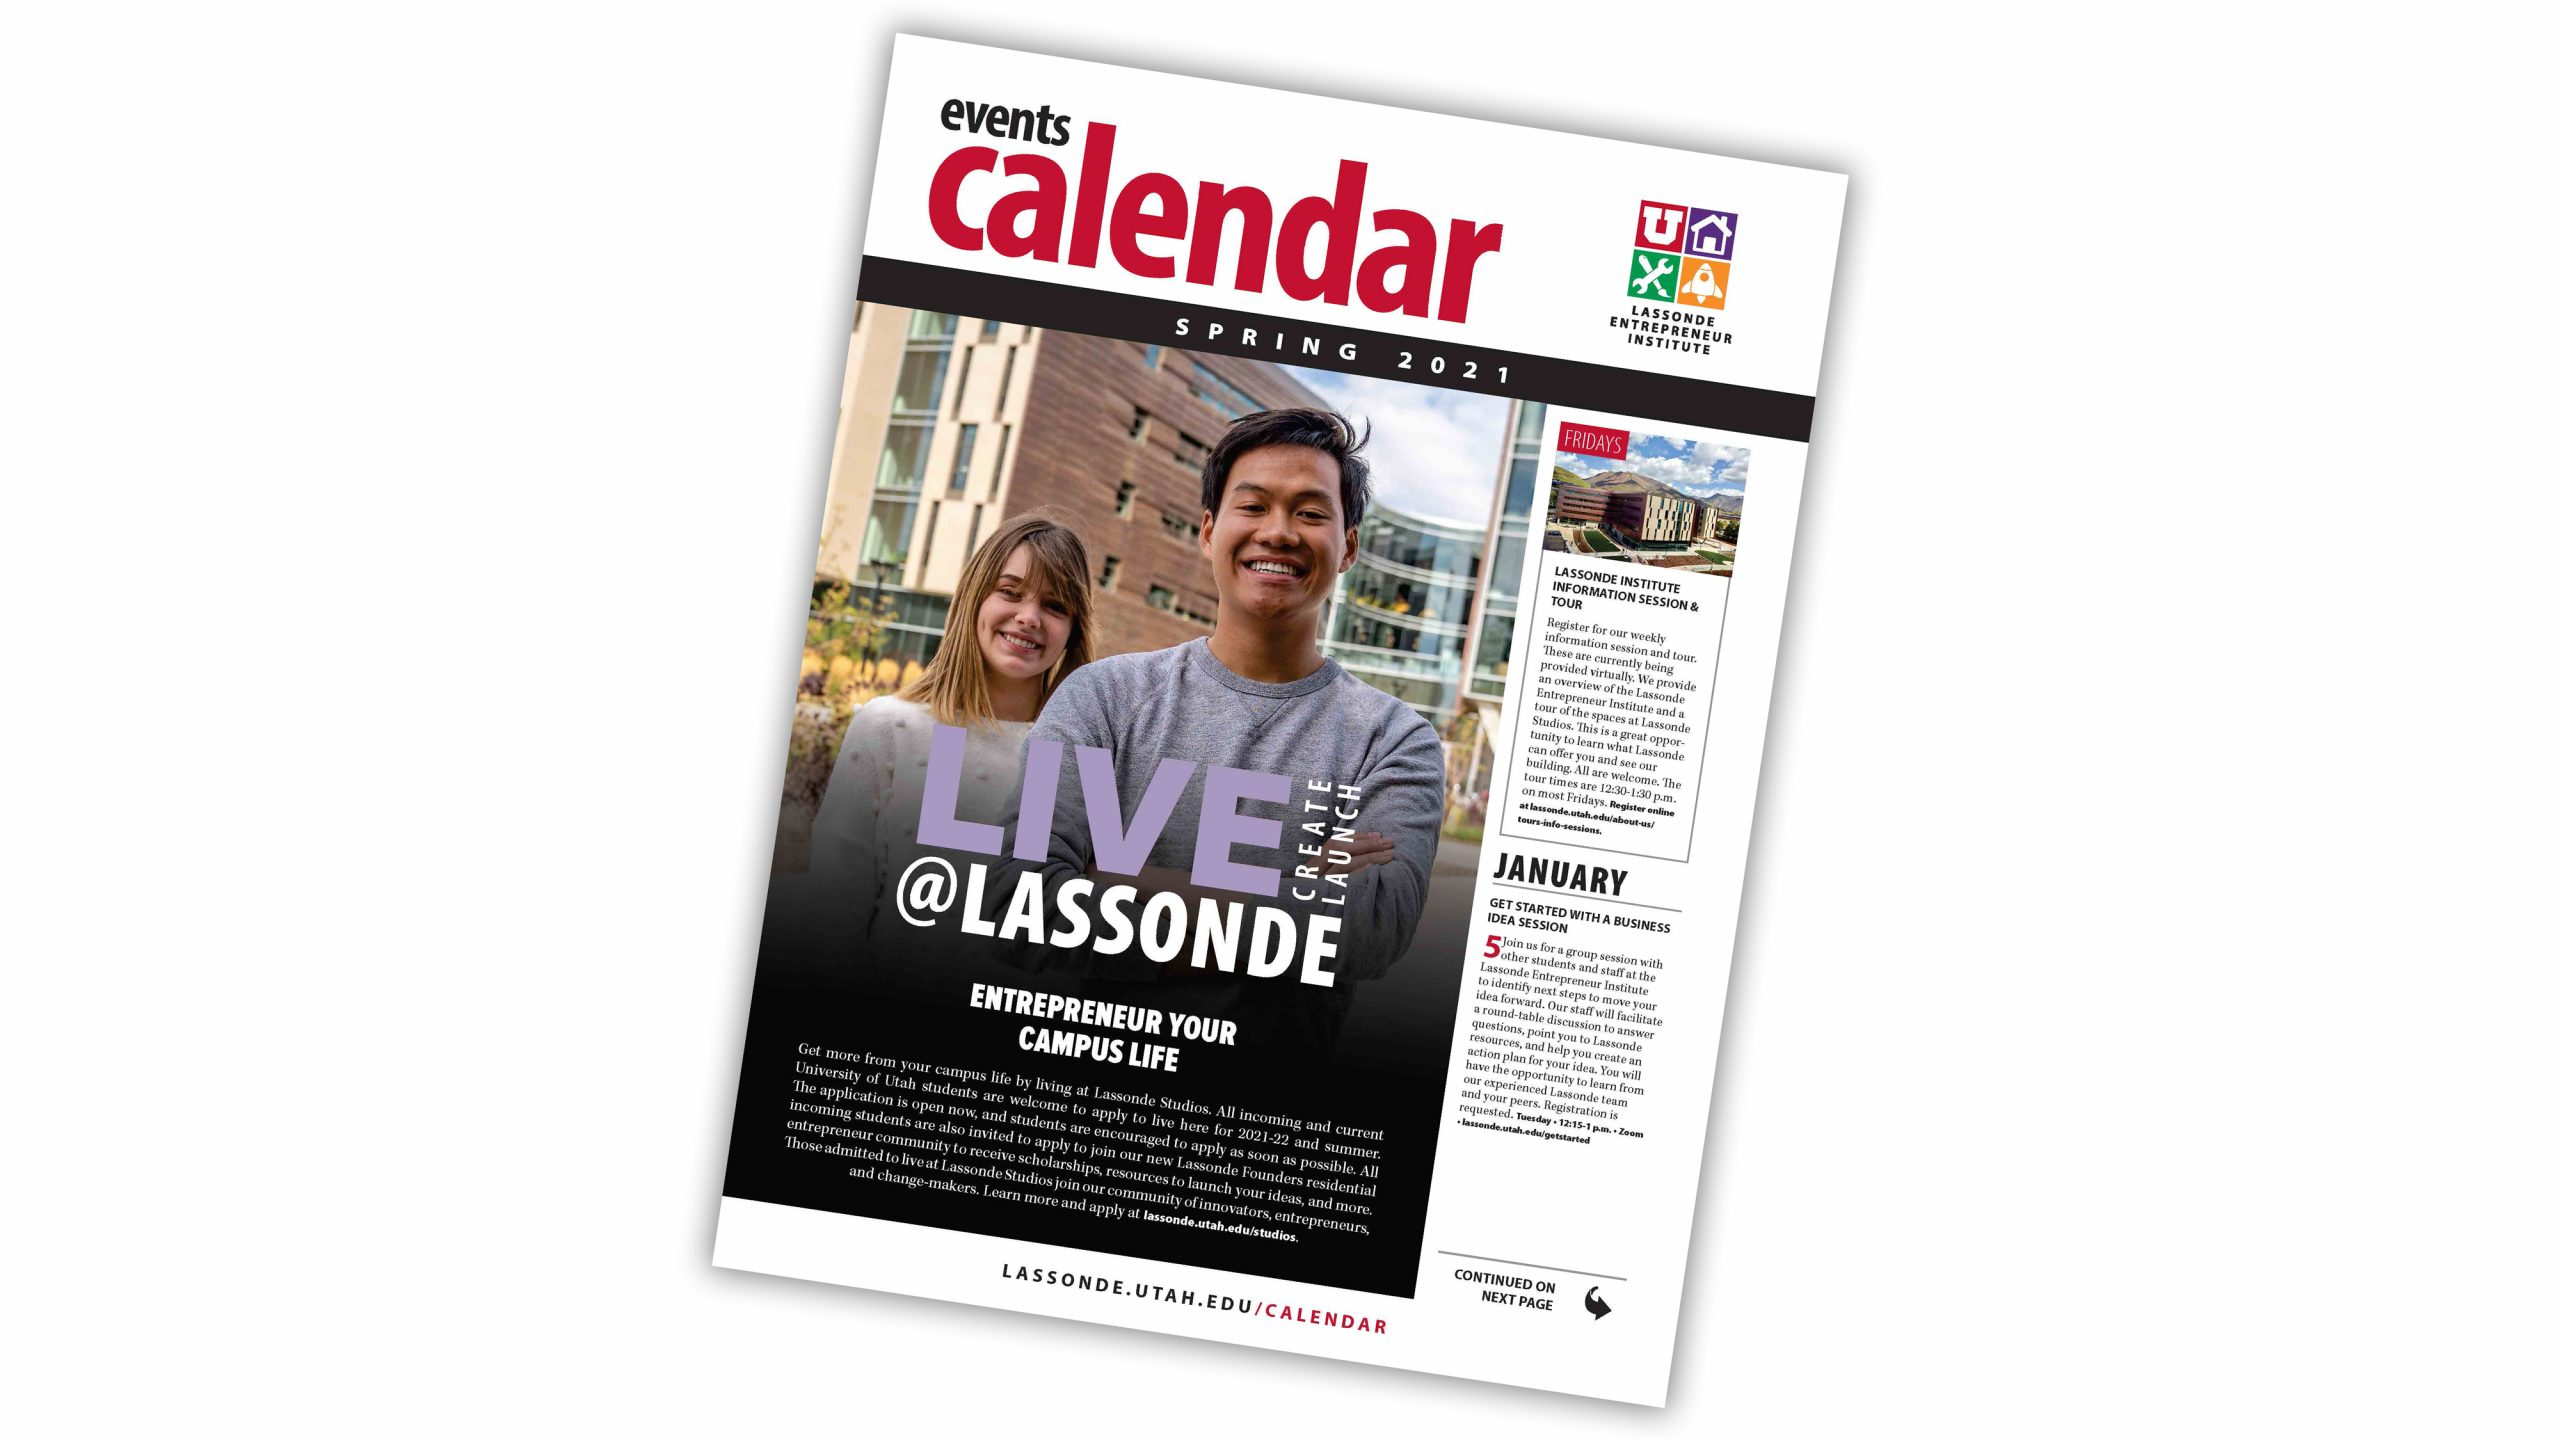 Lassonde Events Calendar: Spring 2021 | Lassonde Entrepreneur